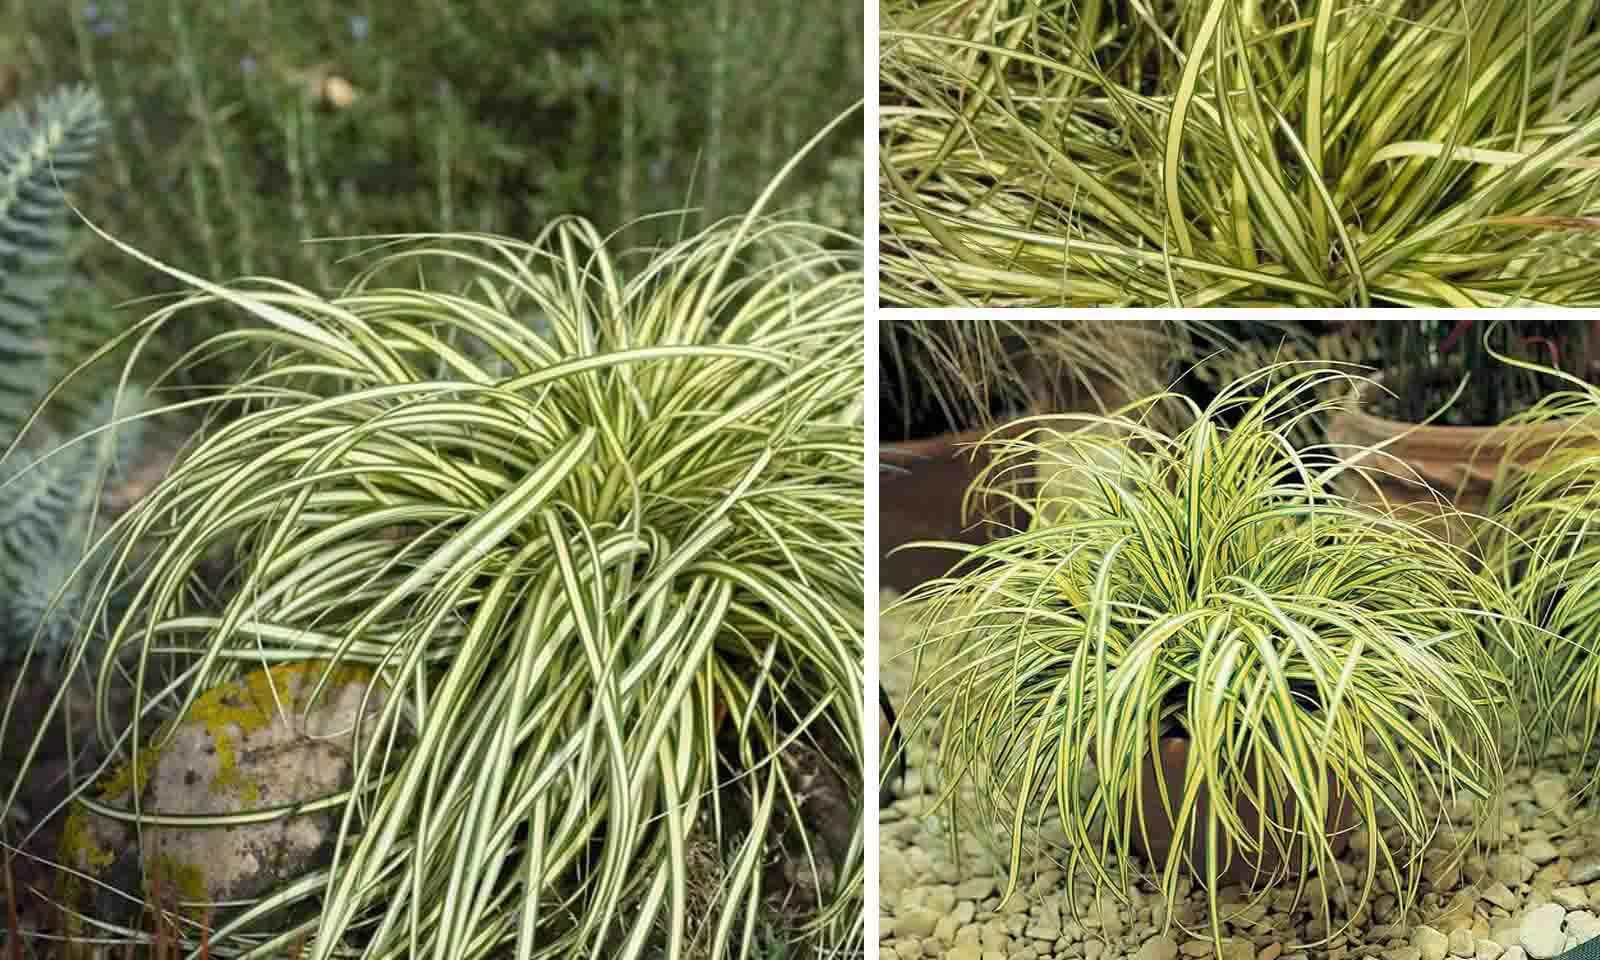 Carex Oshimensis Evergold (Japanes Sedge Evergold)